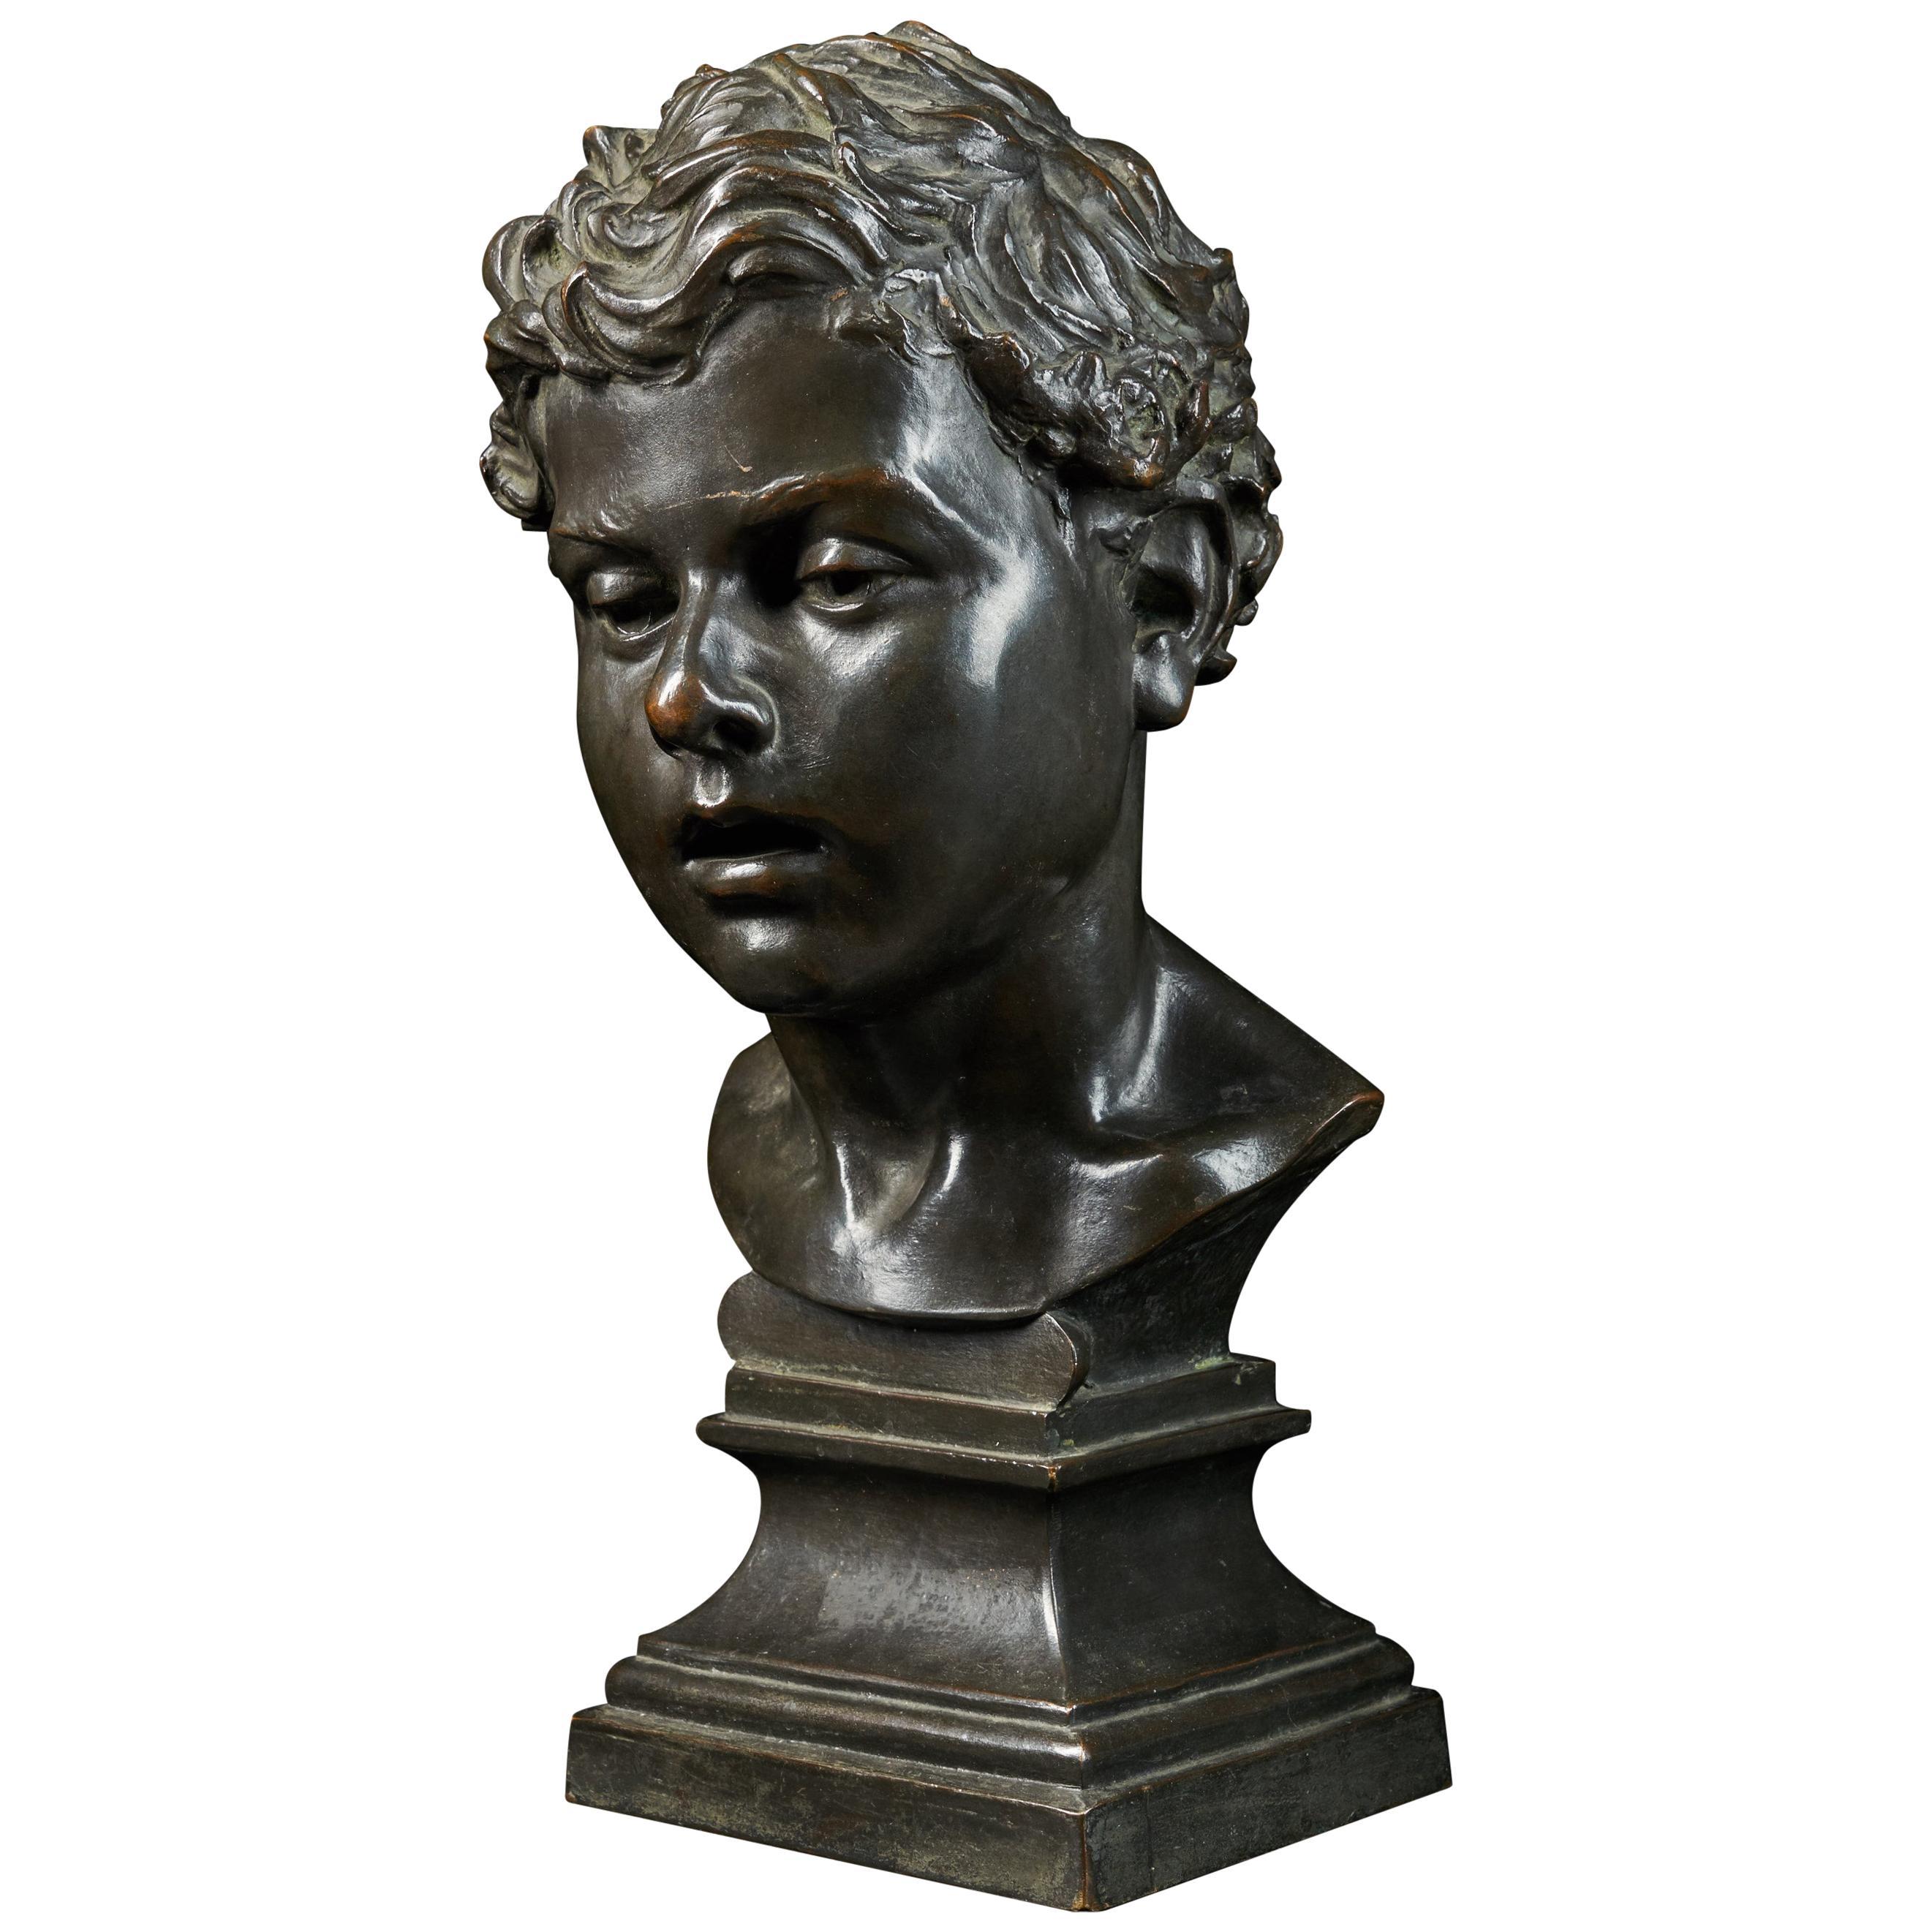 H.Van Hoeter, Bronze Buste of a Young Man, Signed